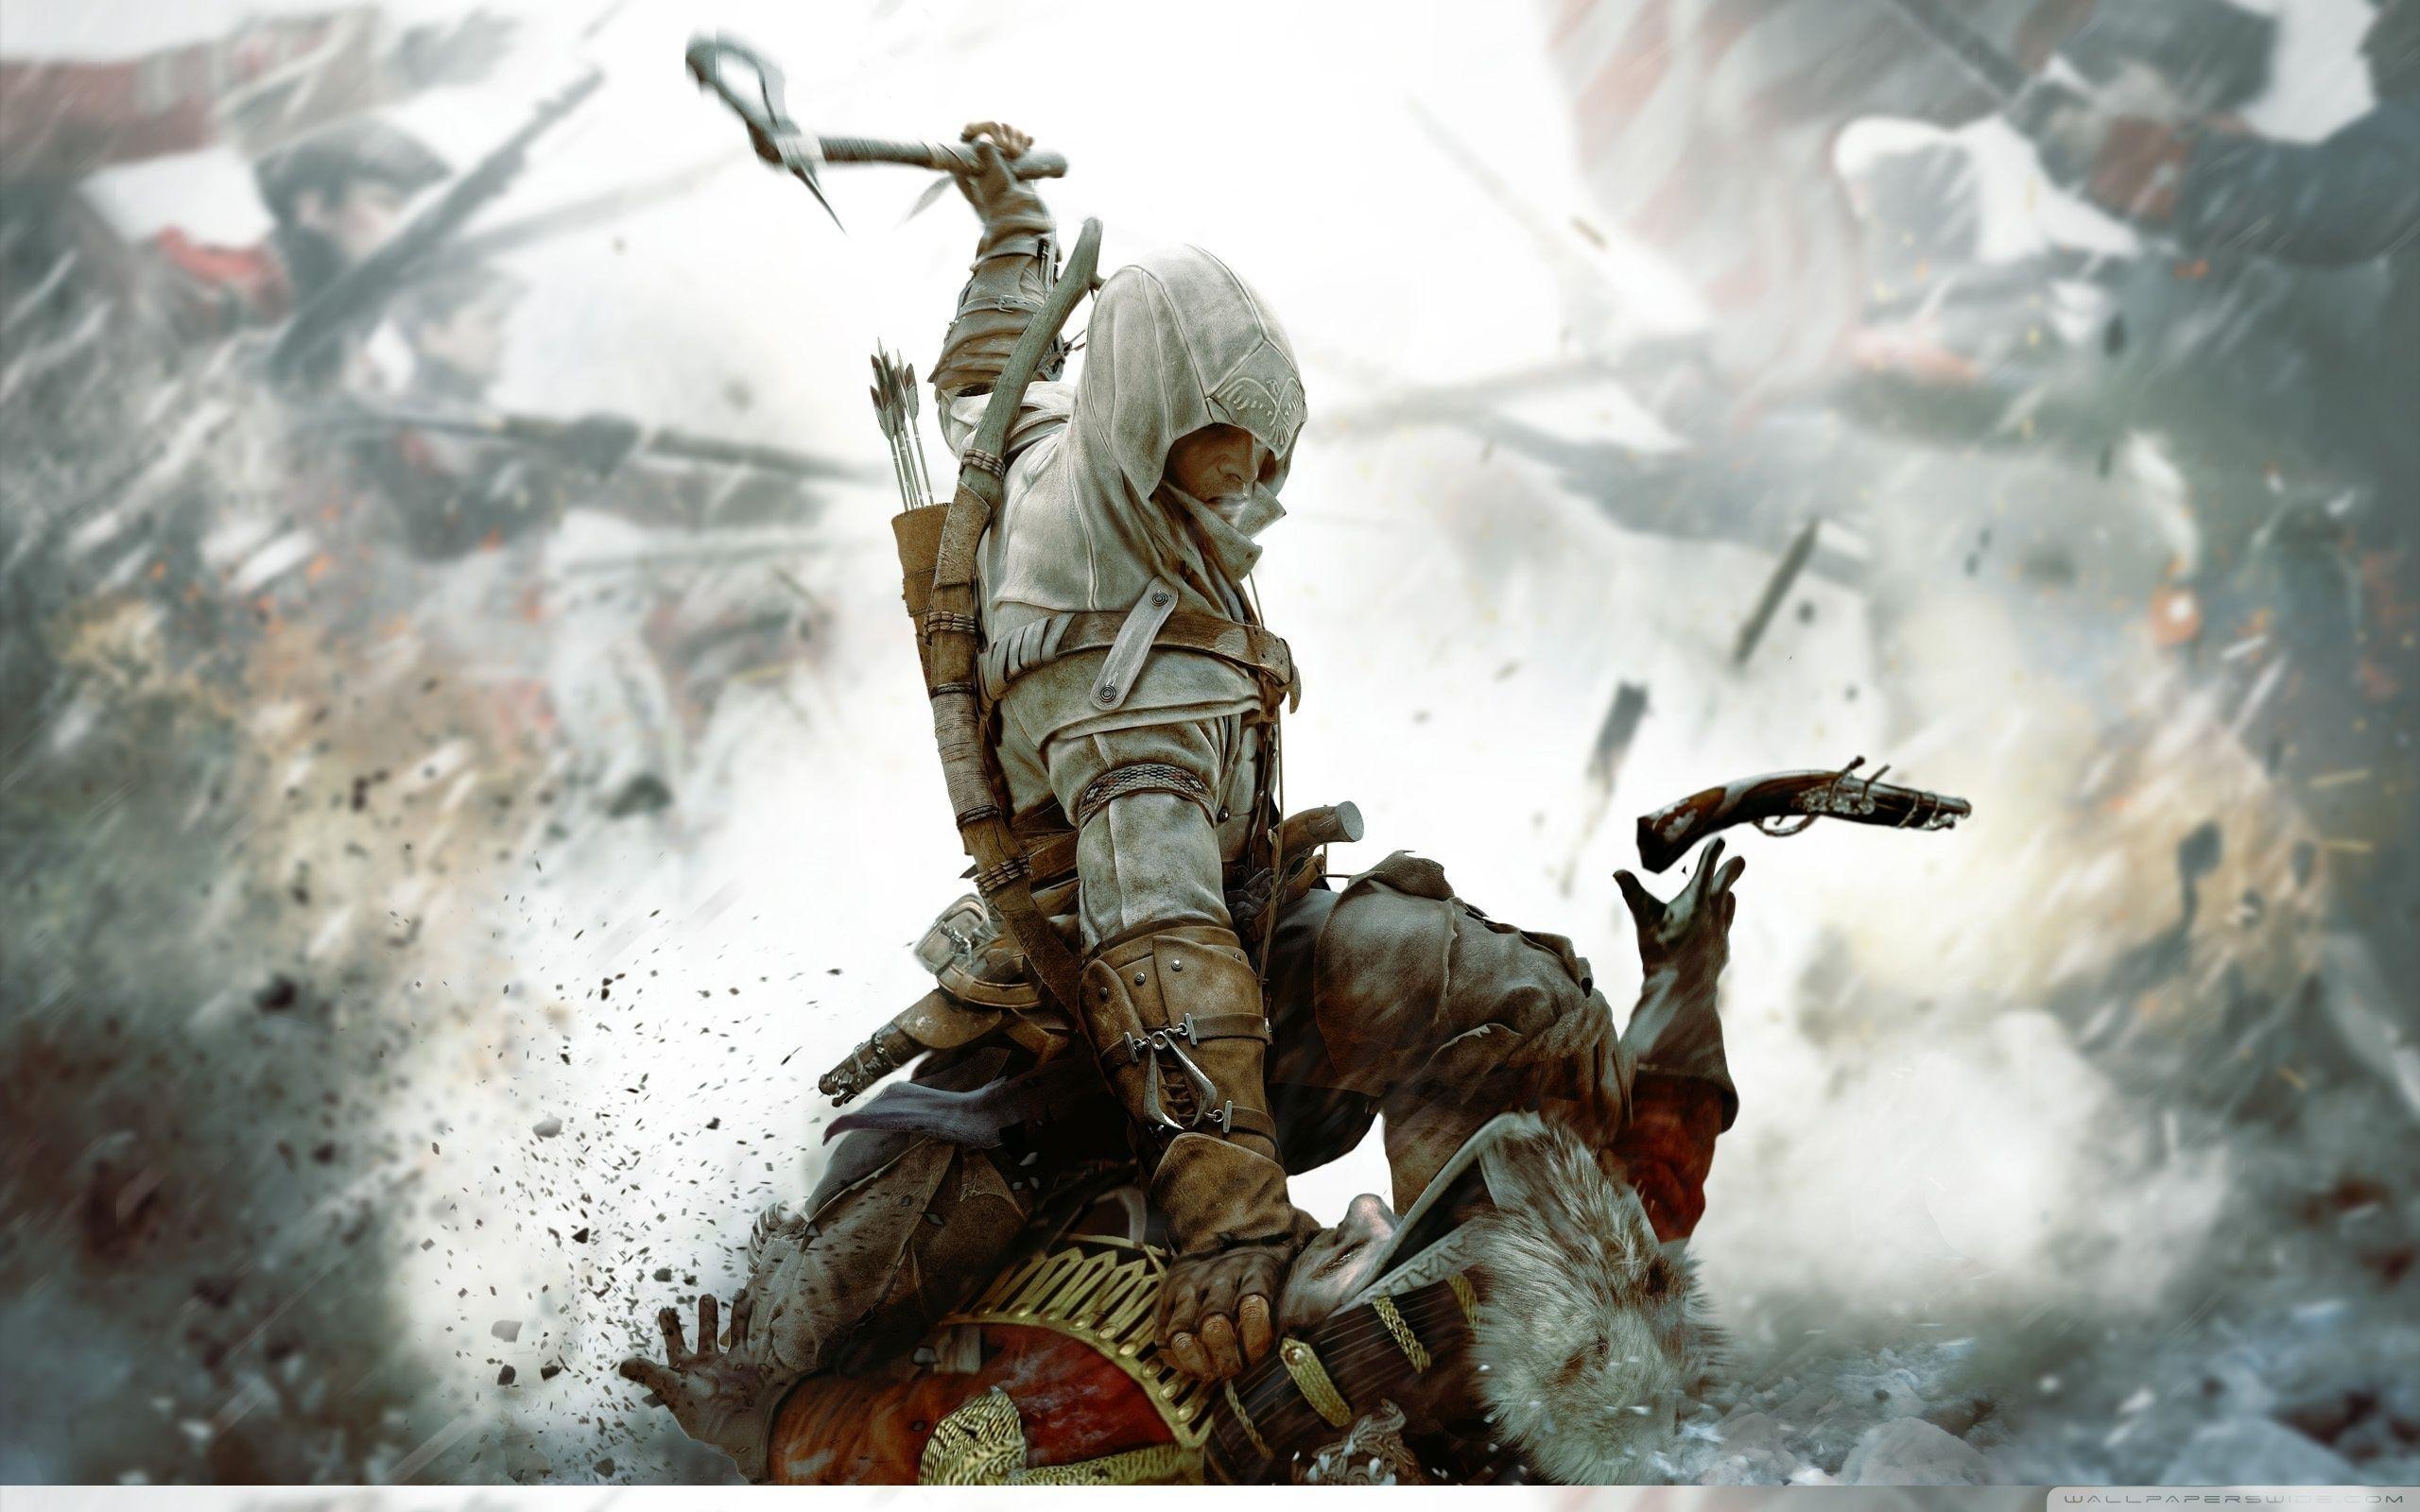 Assassin S Creed Iii Wallpapers Top Free Assassin S Creed Iii